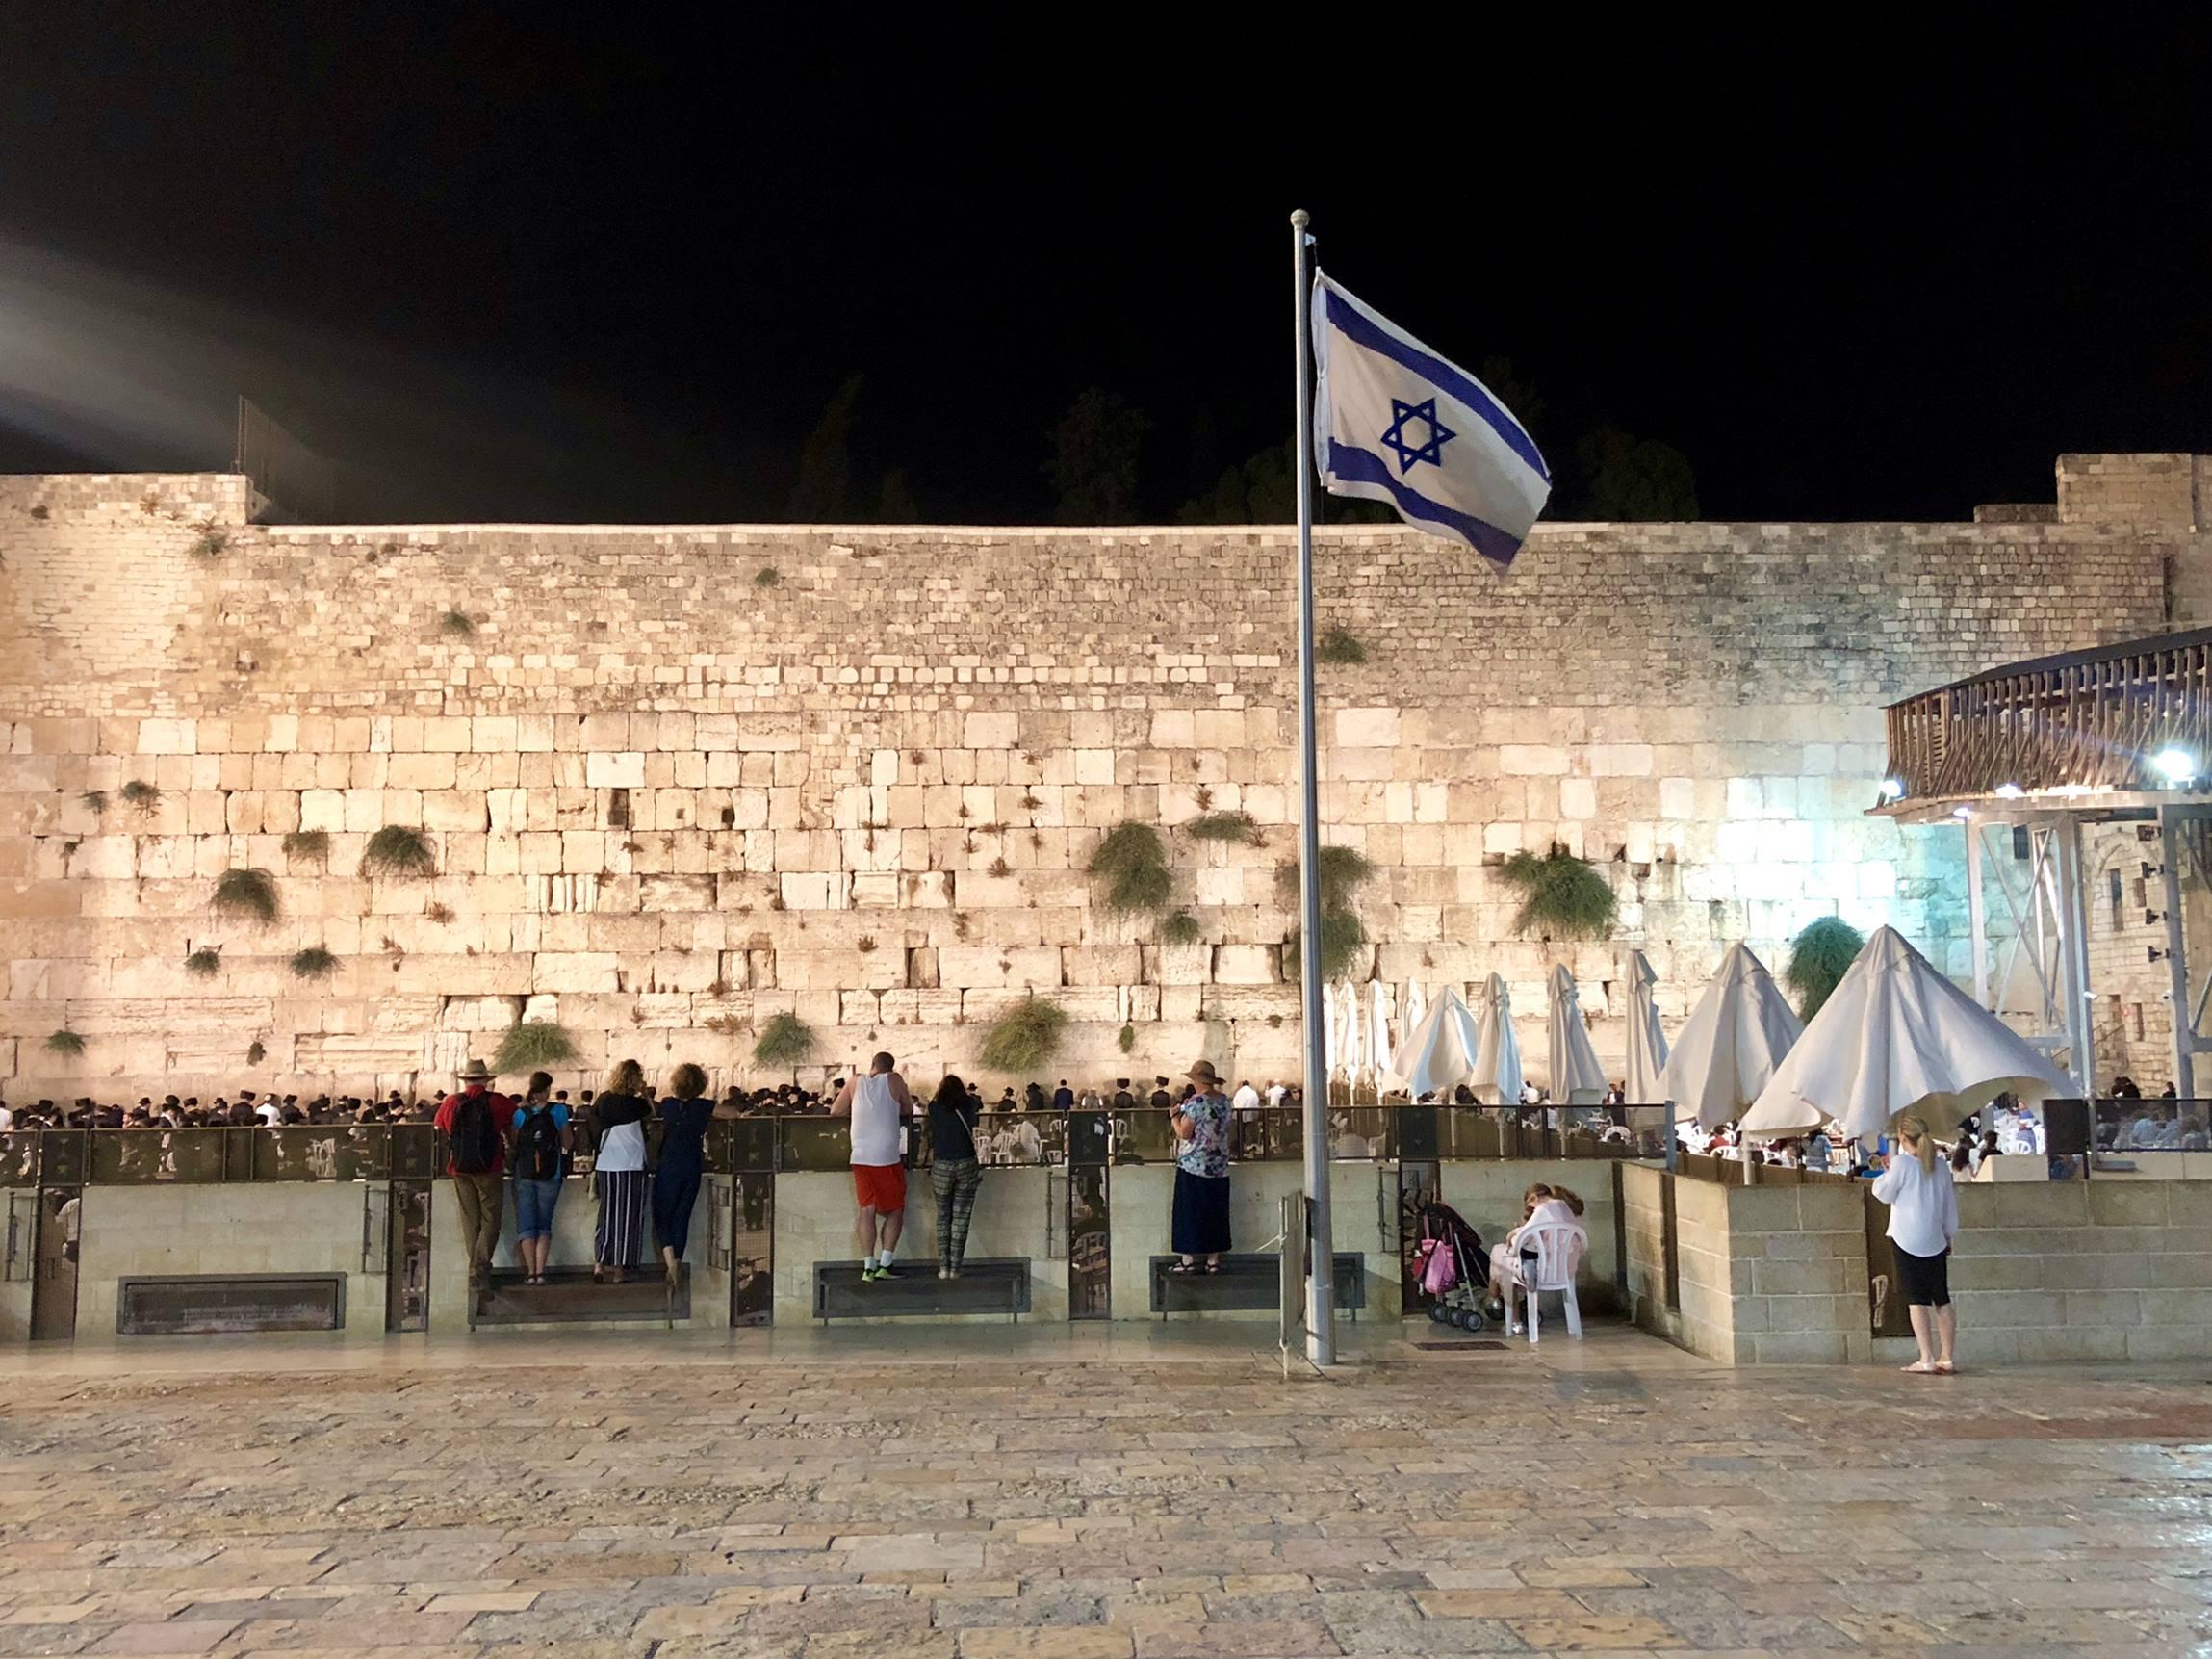 jerusalem_israel_murodaslamentacoes_west